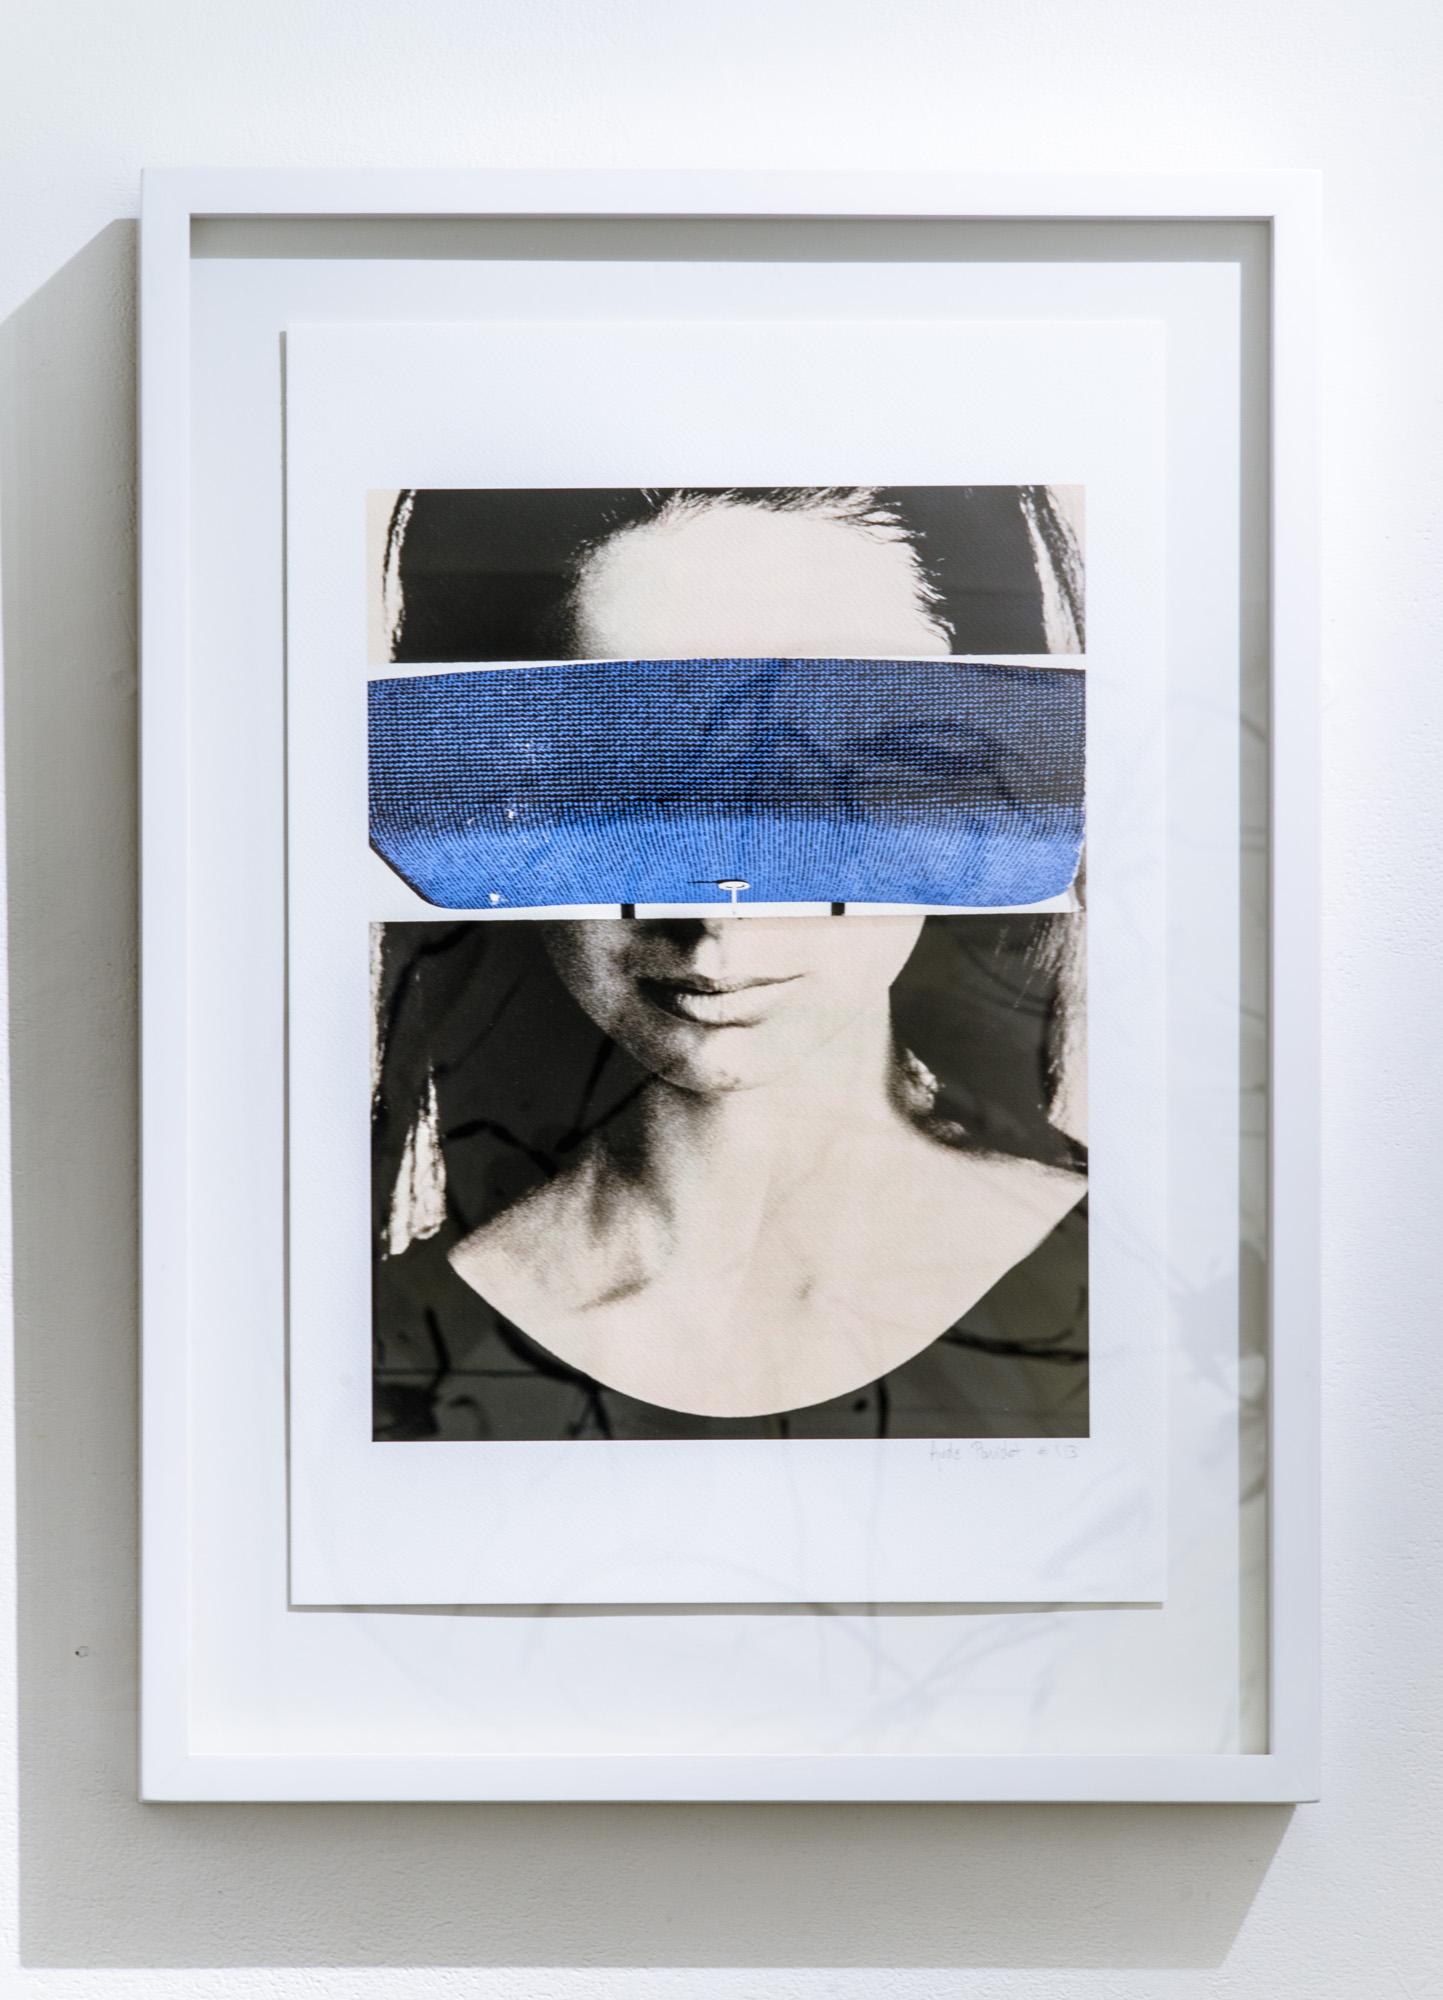 """Soft grounding II"", Ultra-chrome archival pigments print on aquarelle paper 44cm x 61cm, 2018, Edition of 3 +1AP"